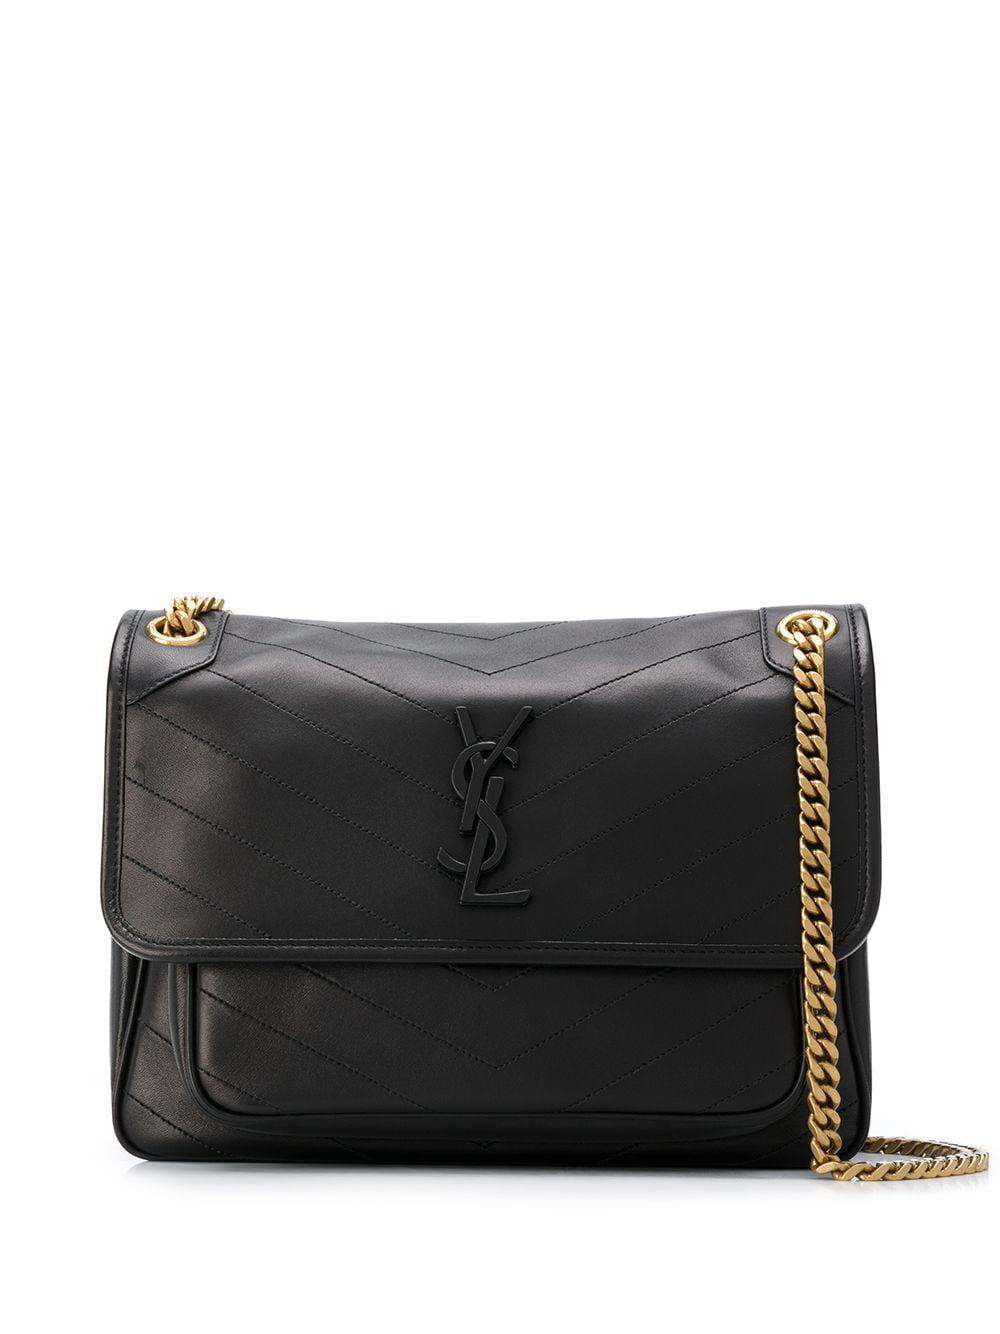 Niki Leather Handbag